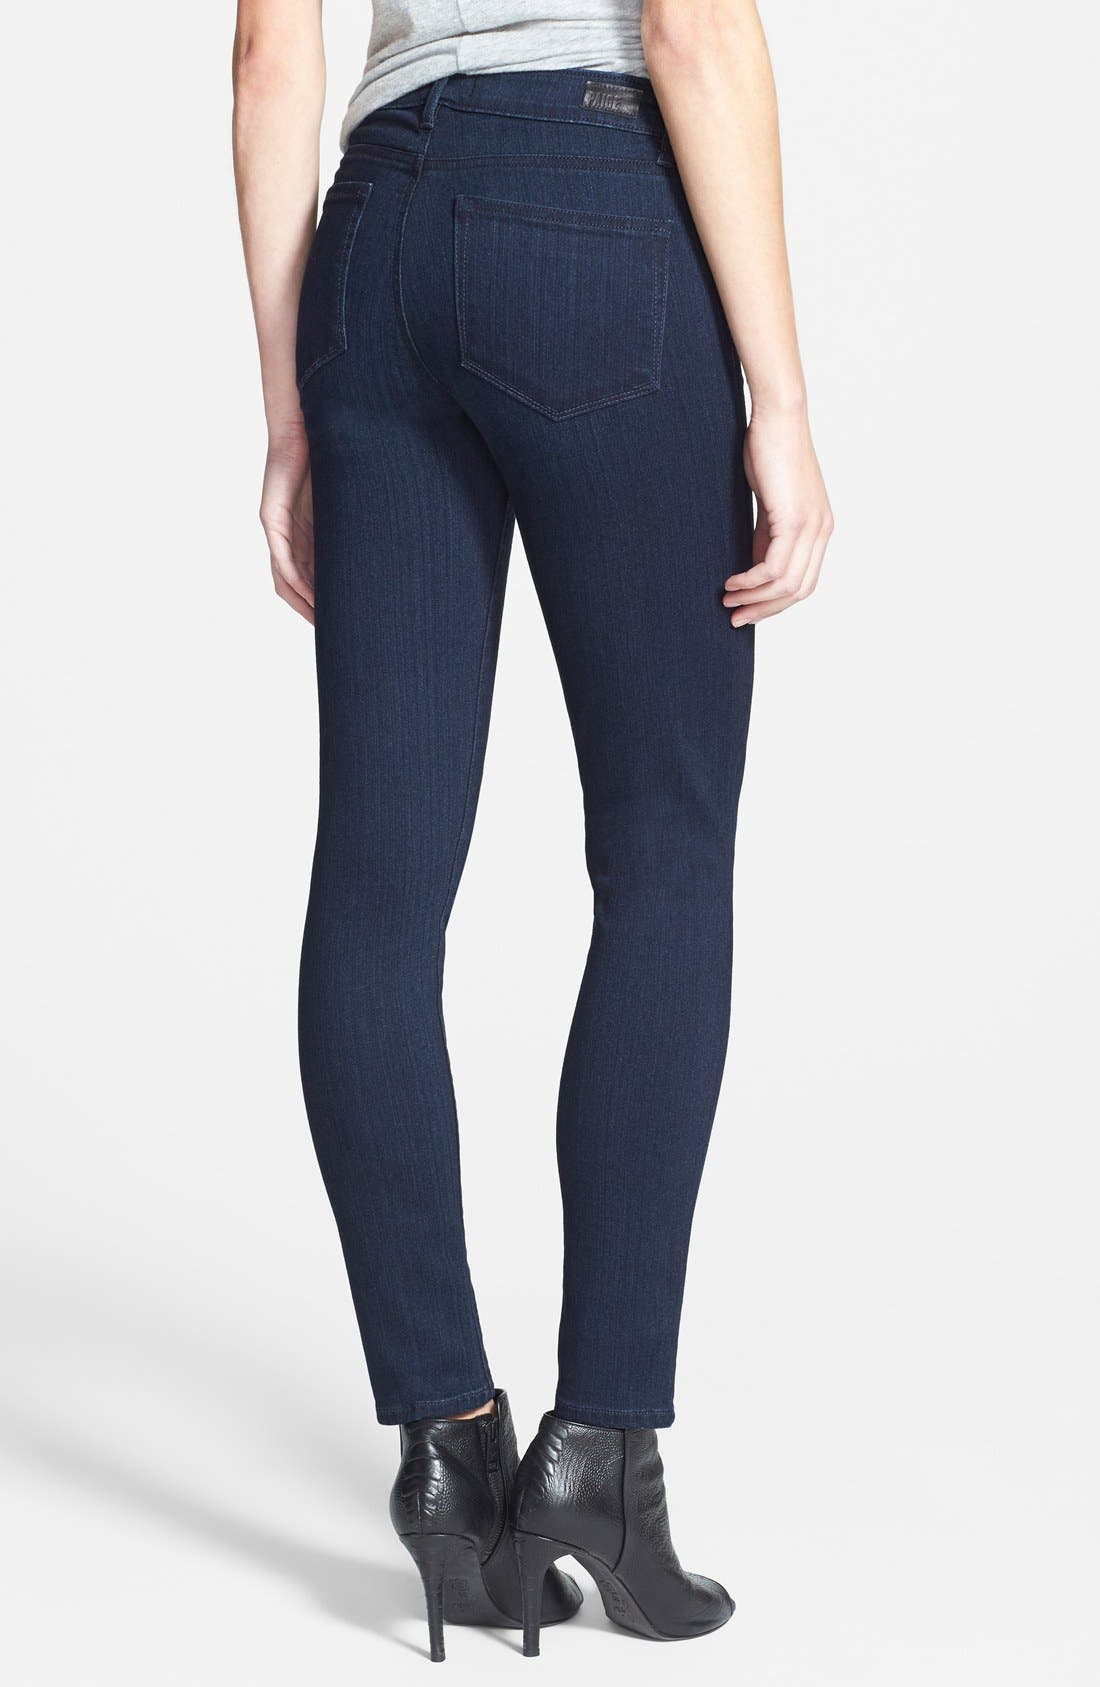 Alternate Image 2  - PAIGE 'Transcend - Verdugo' Ankle Jeans (Mae)